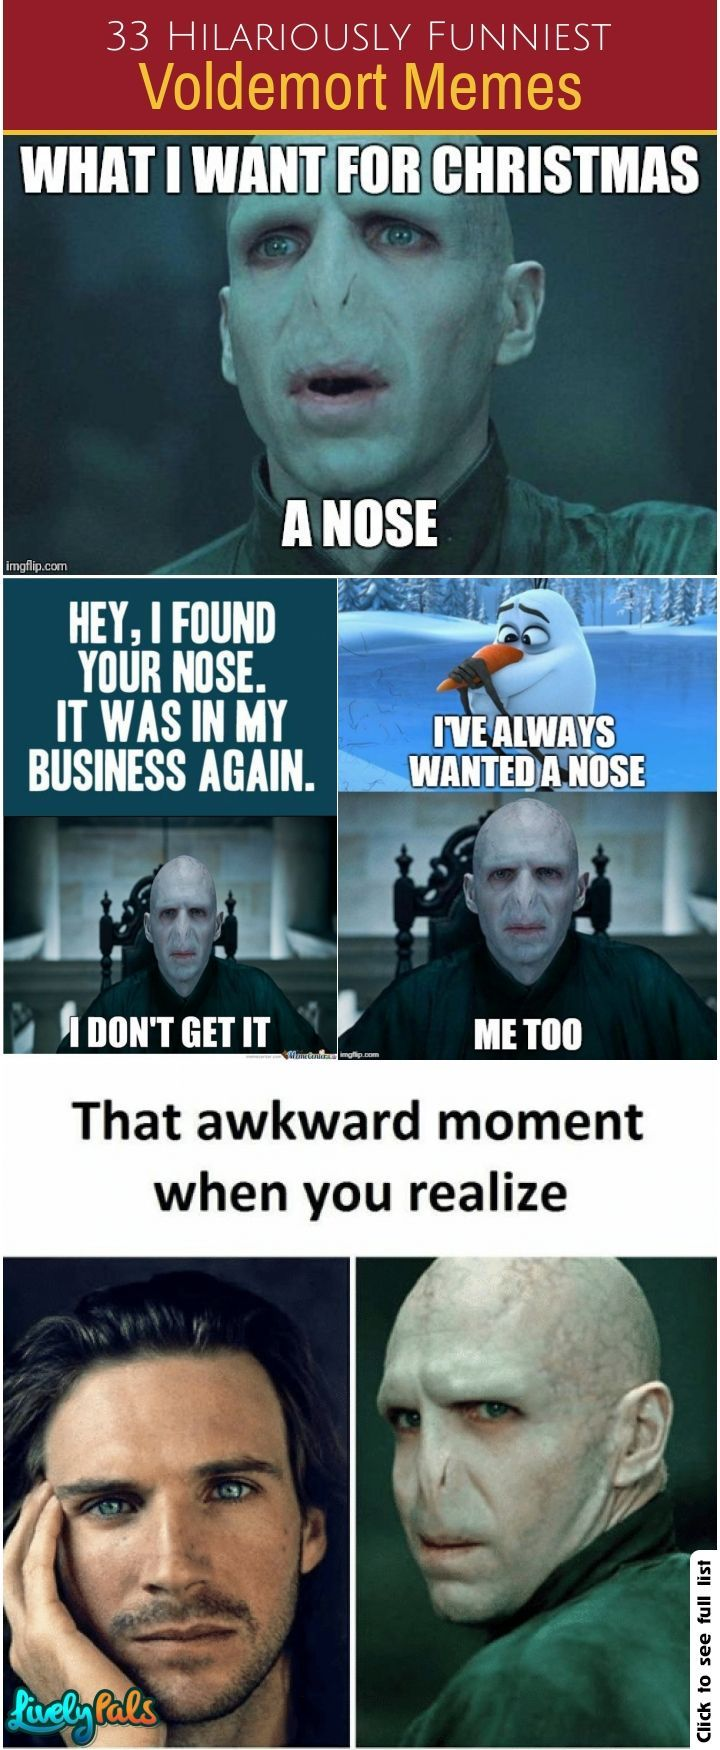 33 Funniest Voldemort Memes Harrypotter Voldermemes Funnymemes Livelymemes Lord Voldemort Memes Voldemort Harry Potter Memes Hilarious